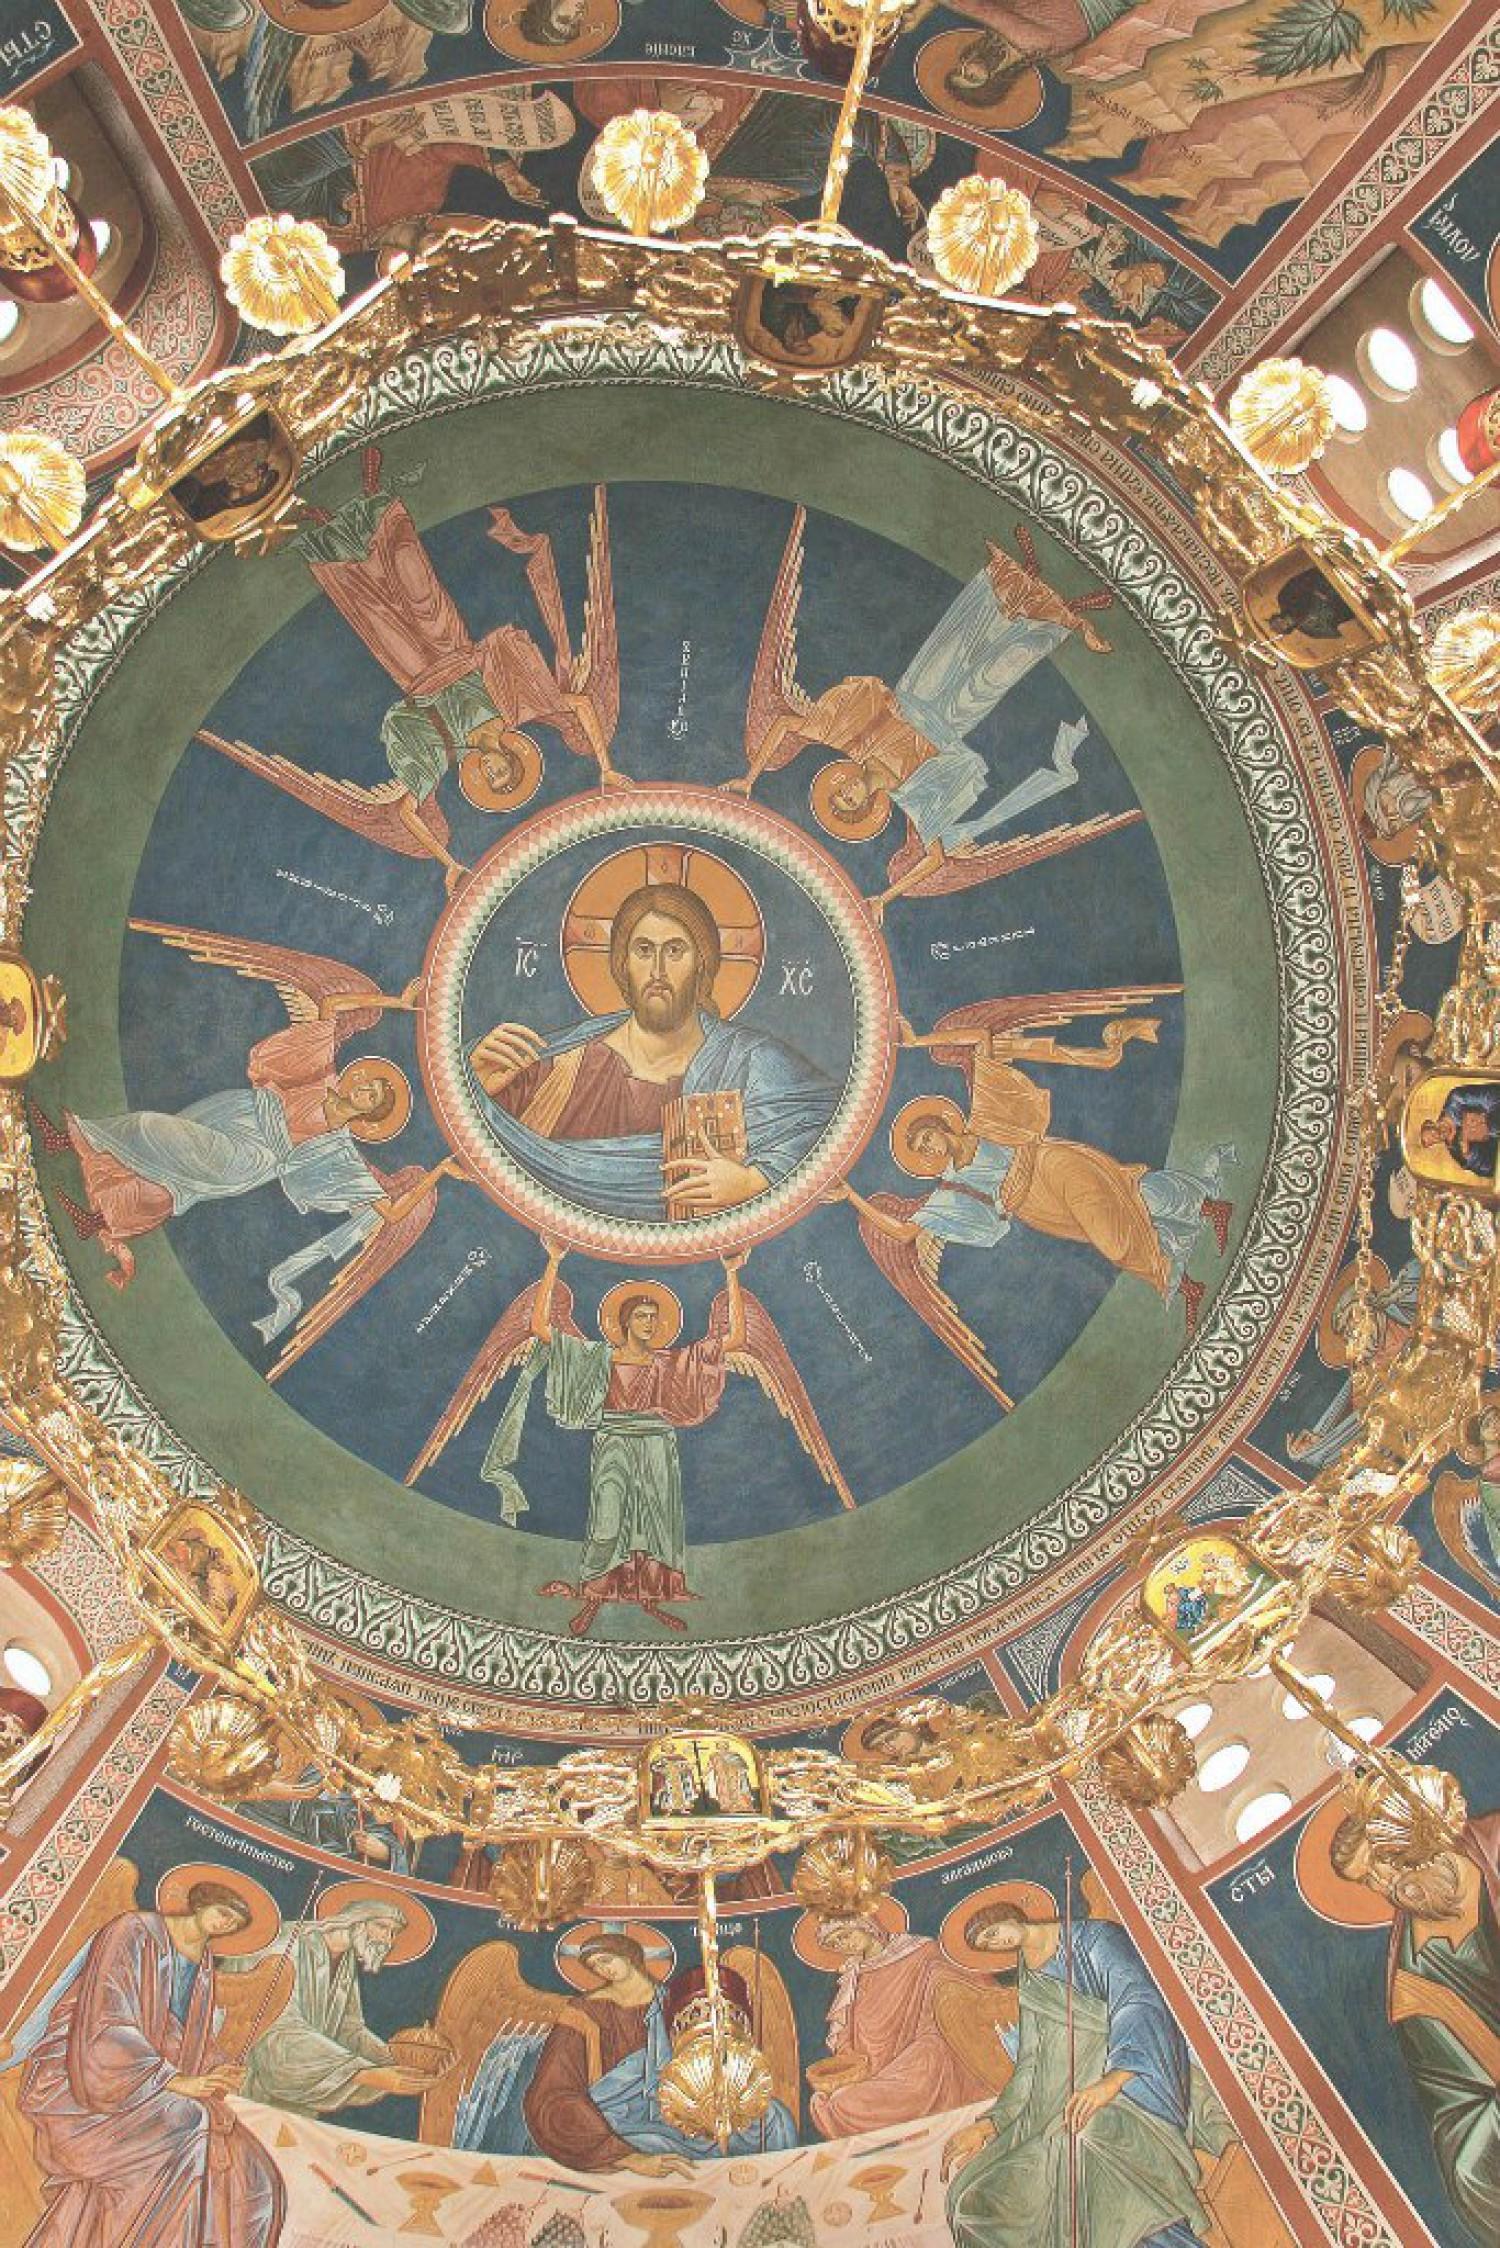 Н.А.Мухин. Росписи часовни свт.Тихона Задонского. Лепавина, Хорватия. 2007 - 2008